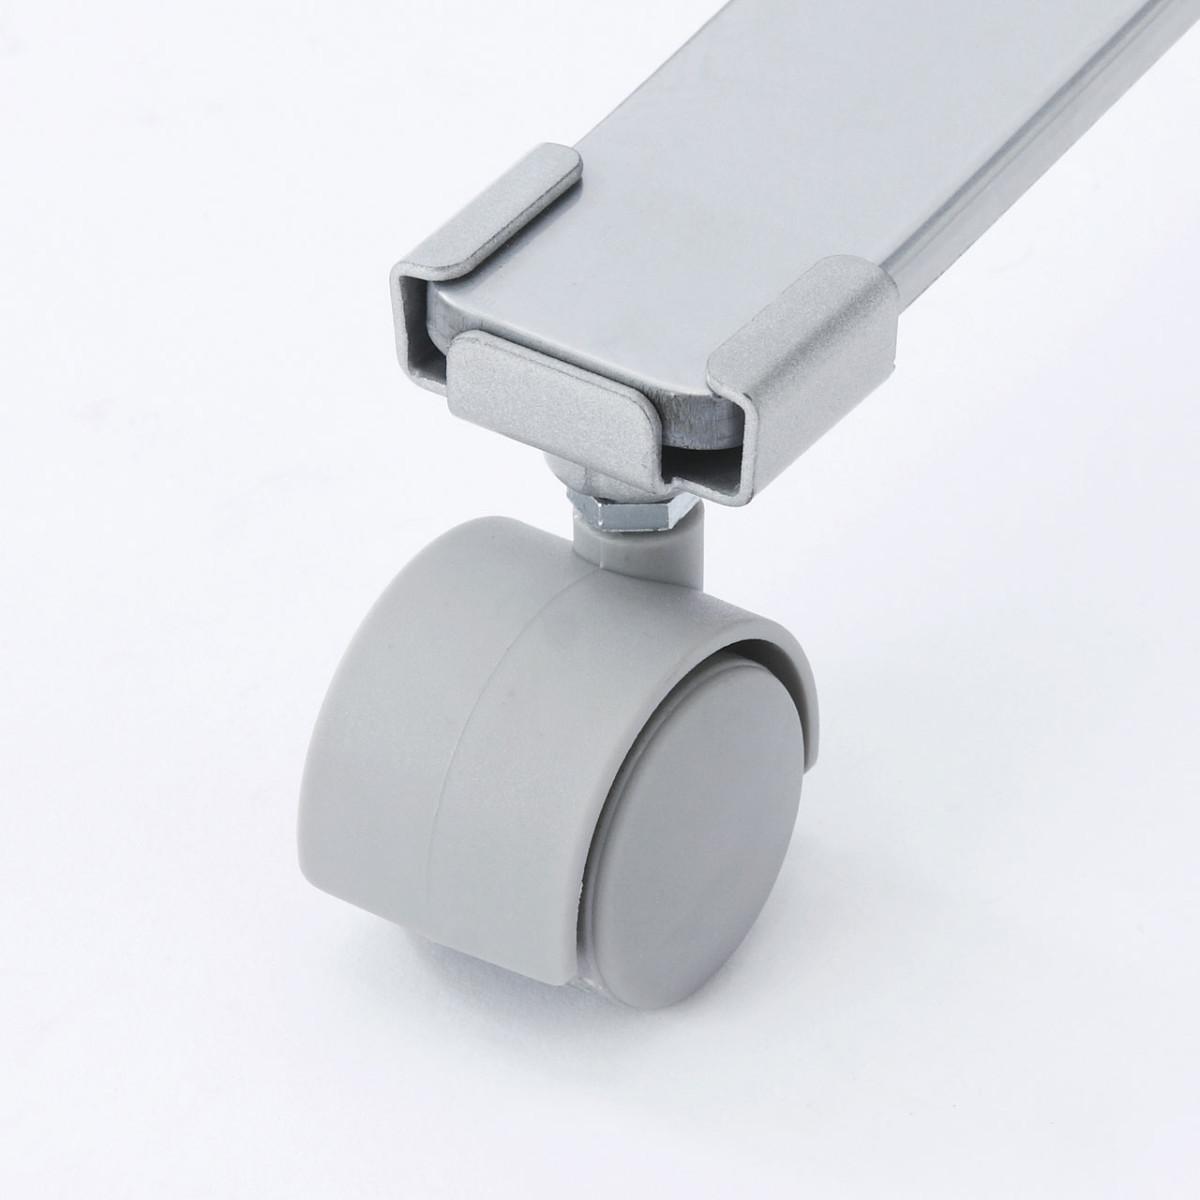 [SPT-CAST] 【代引き不可】パーティション用簡易キャスター